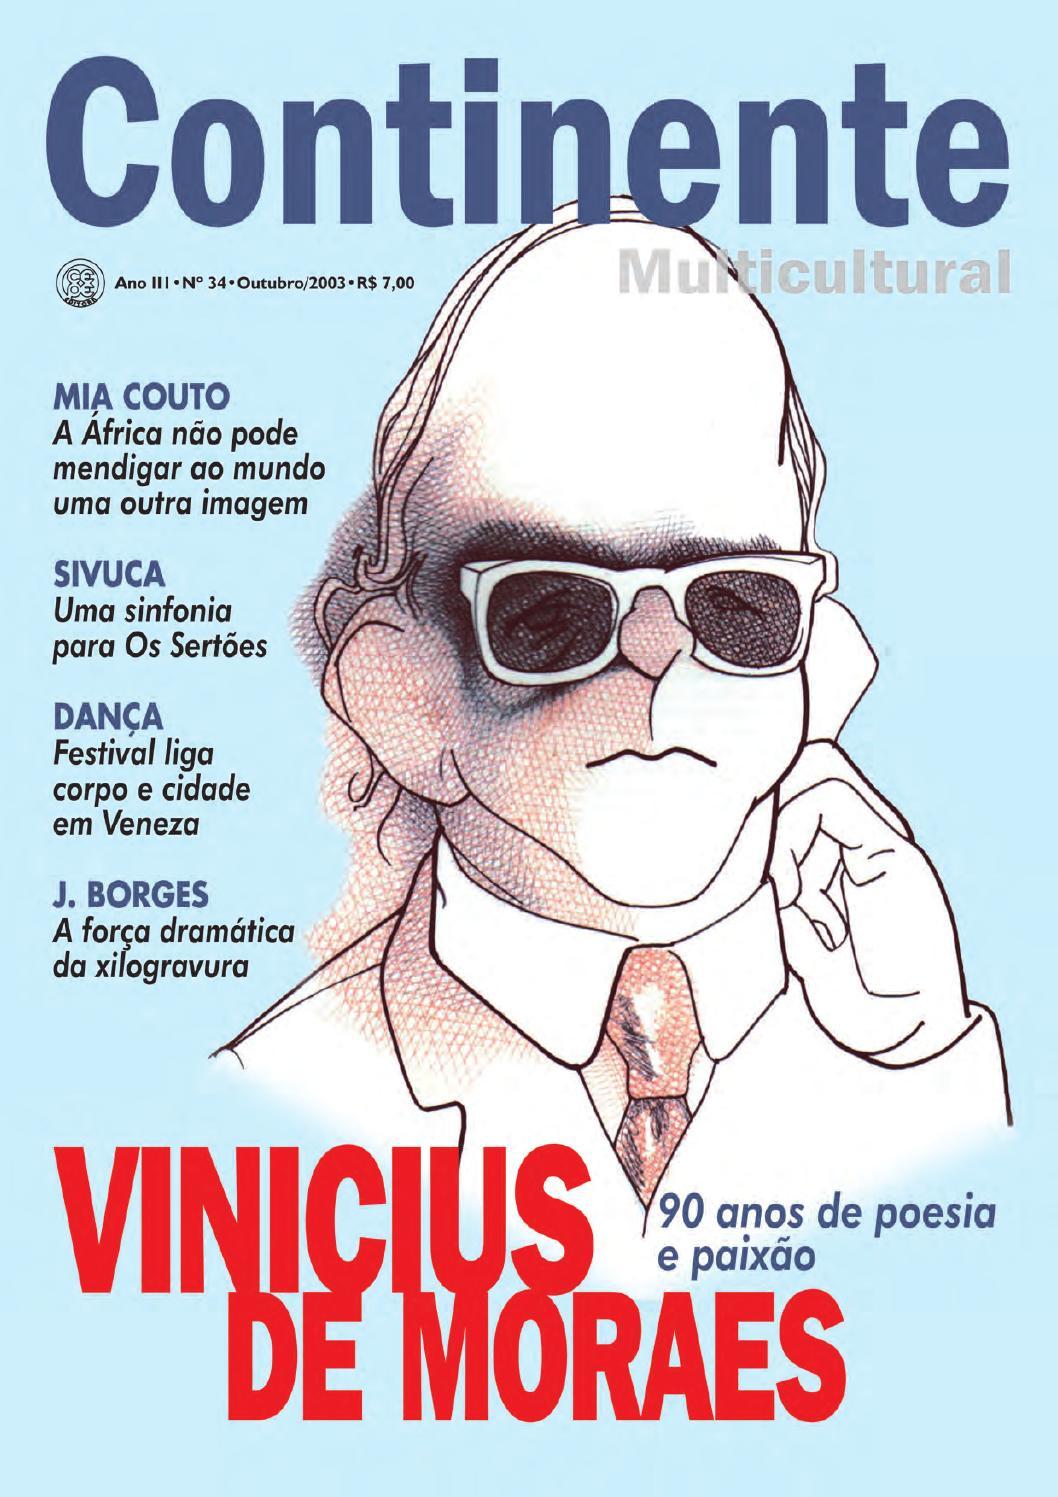 SINFONICO SIVUCA BAIXAR CD